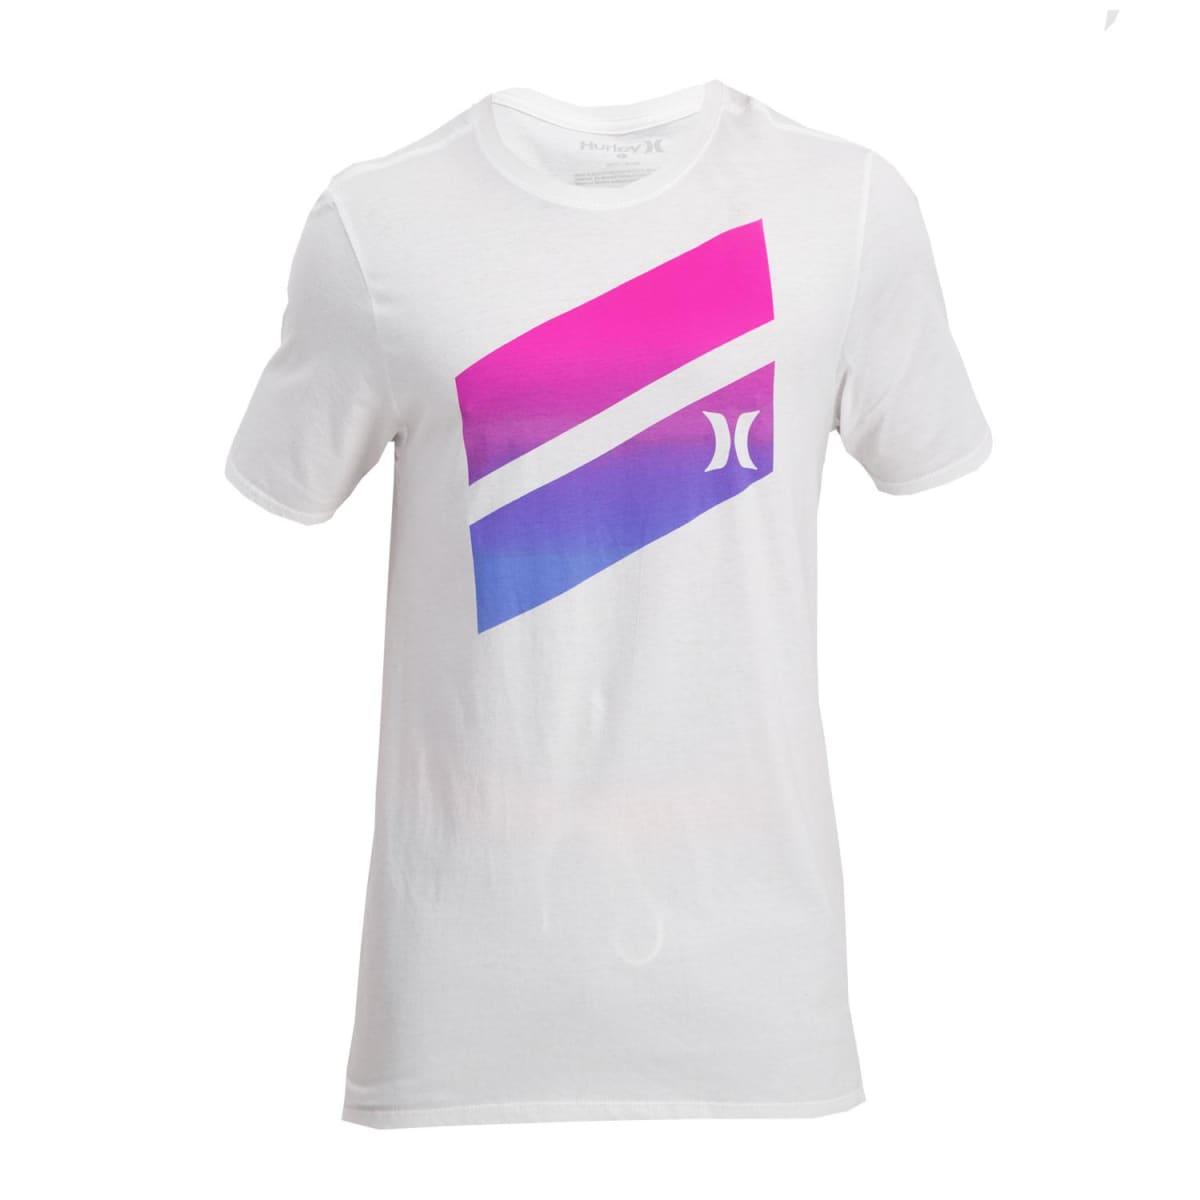 Men Sportsmans Warehouse Torch Tshirt Women Pink Fuchsia L Product Image